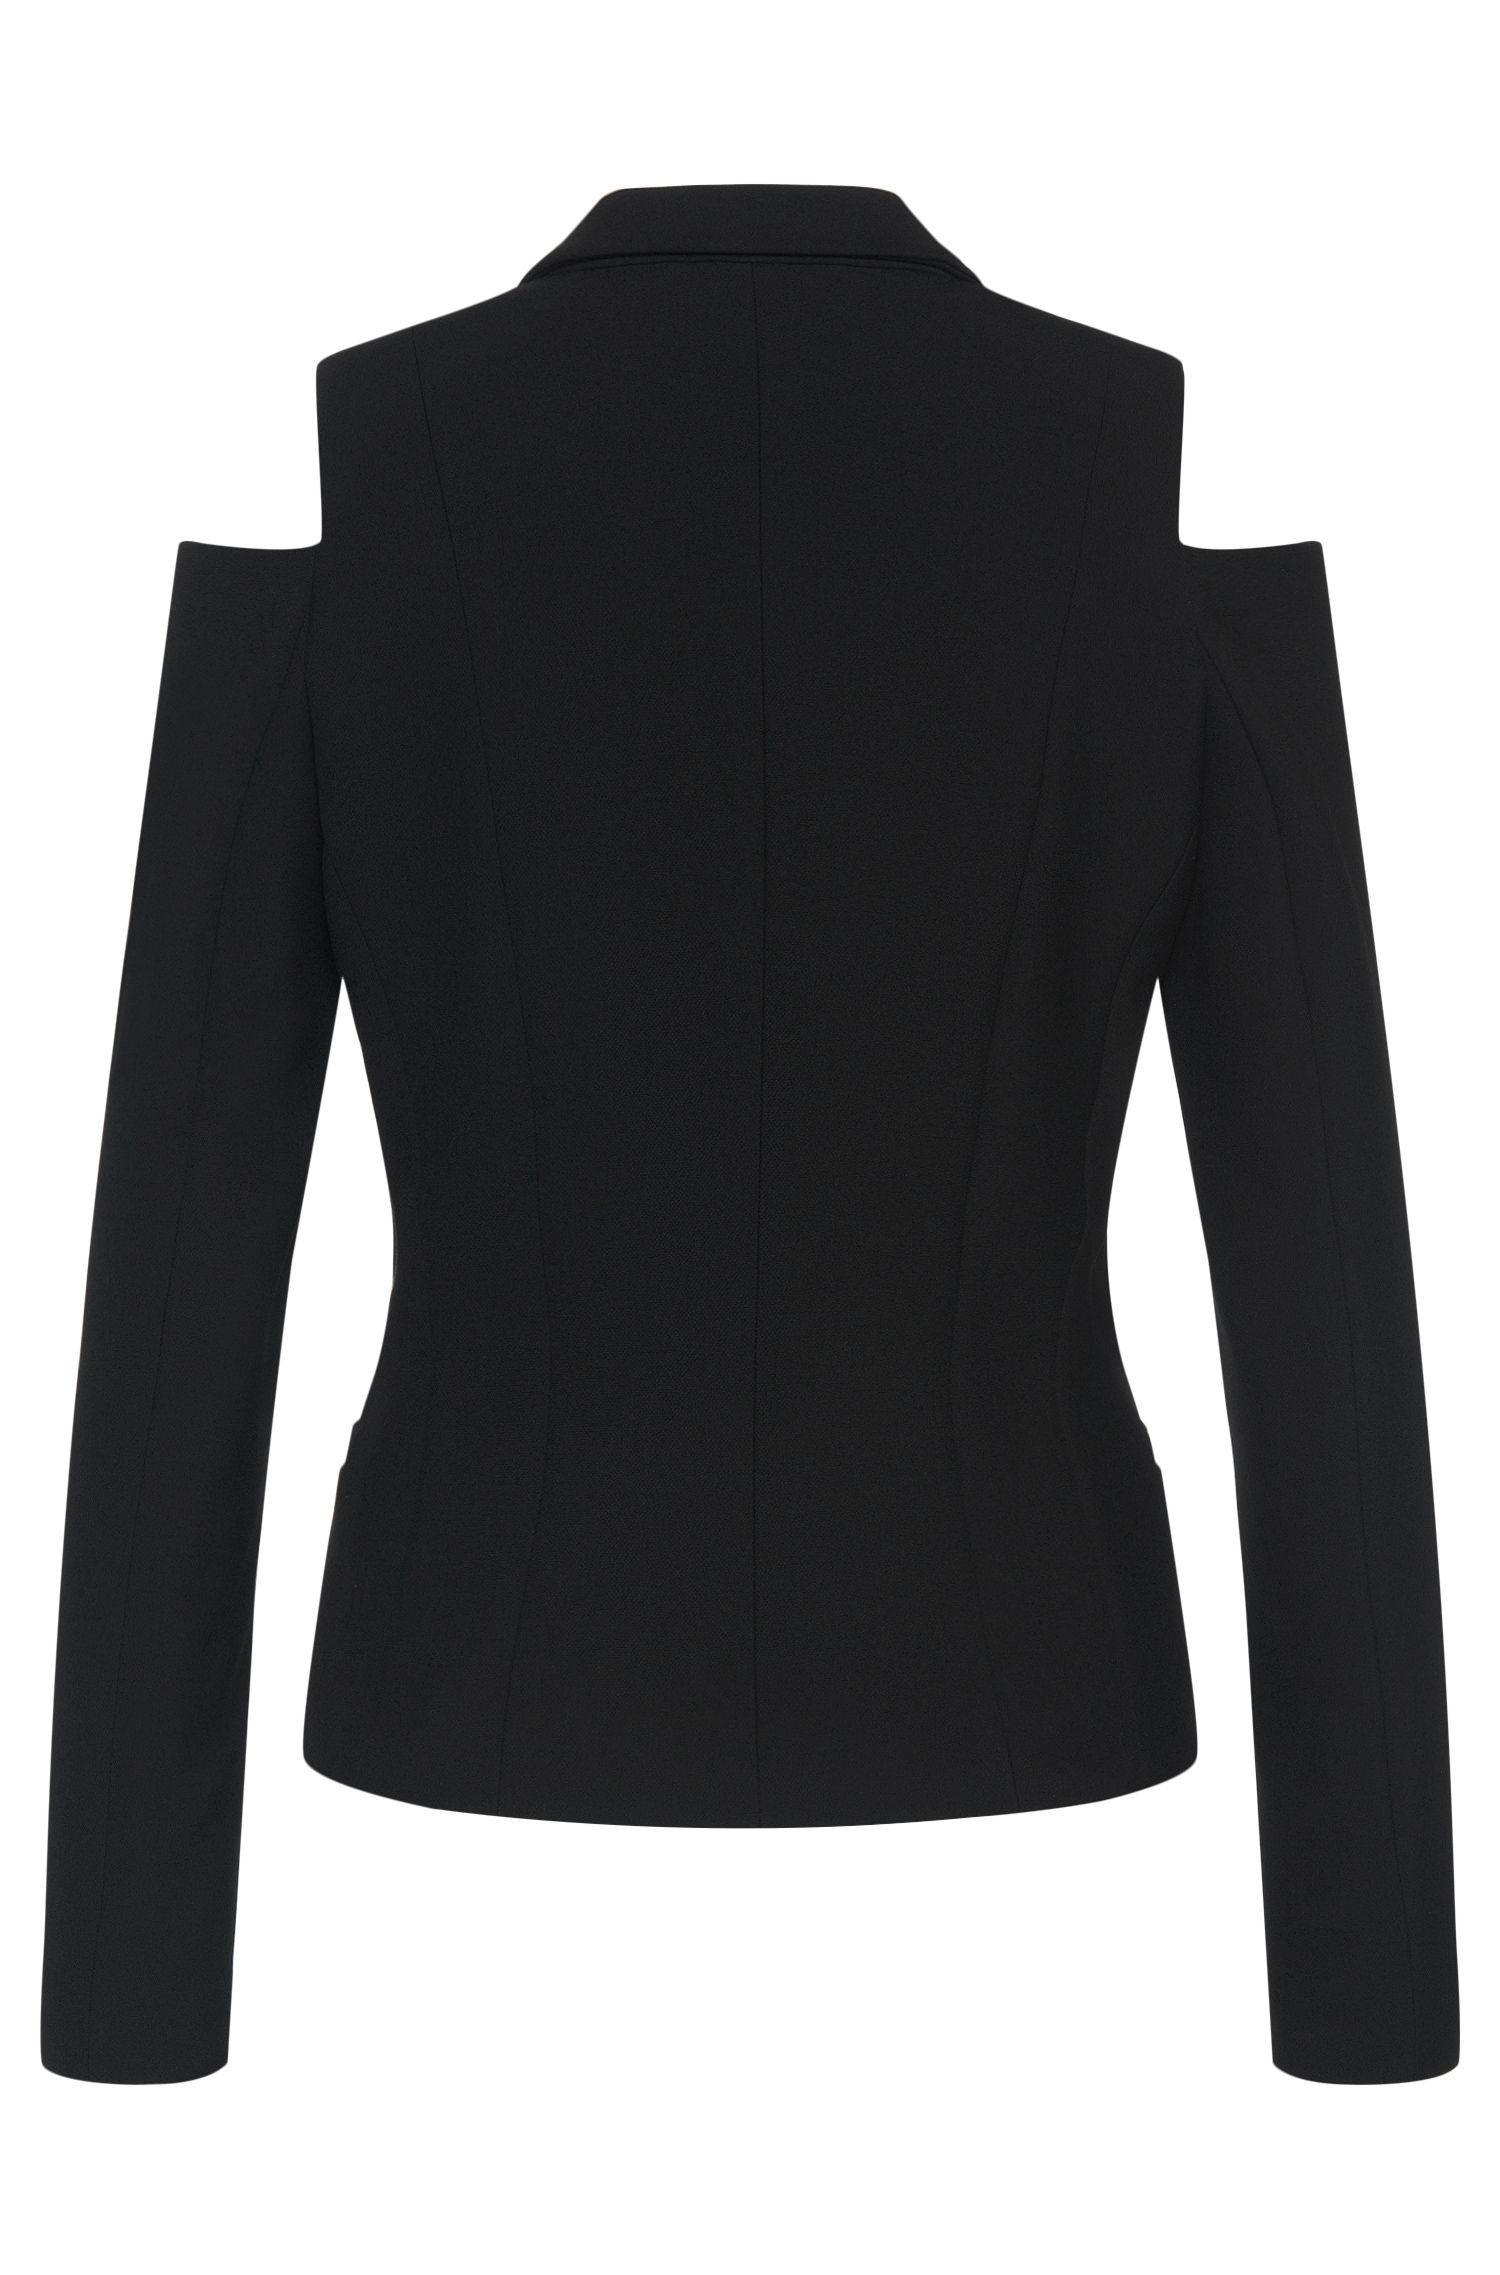 Getailleerde blazer met schouderuitsparingen: 'Ankisa'